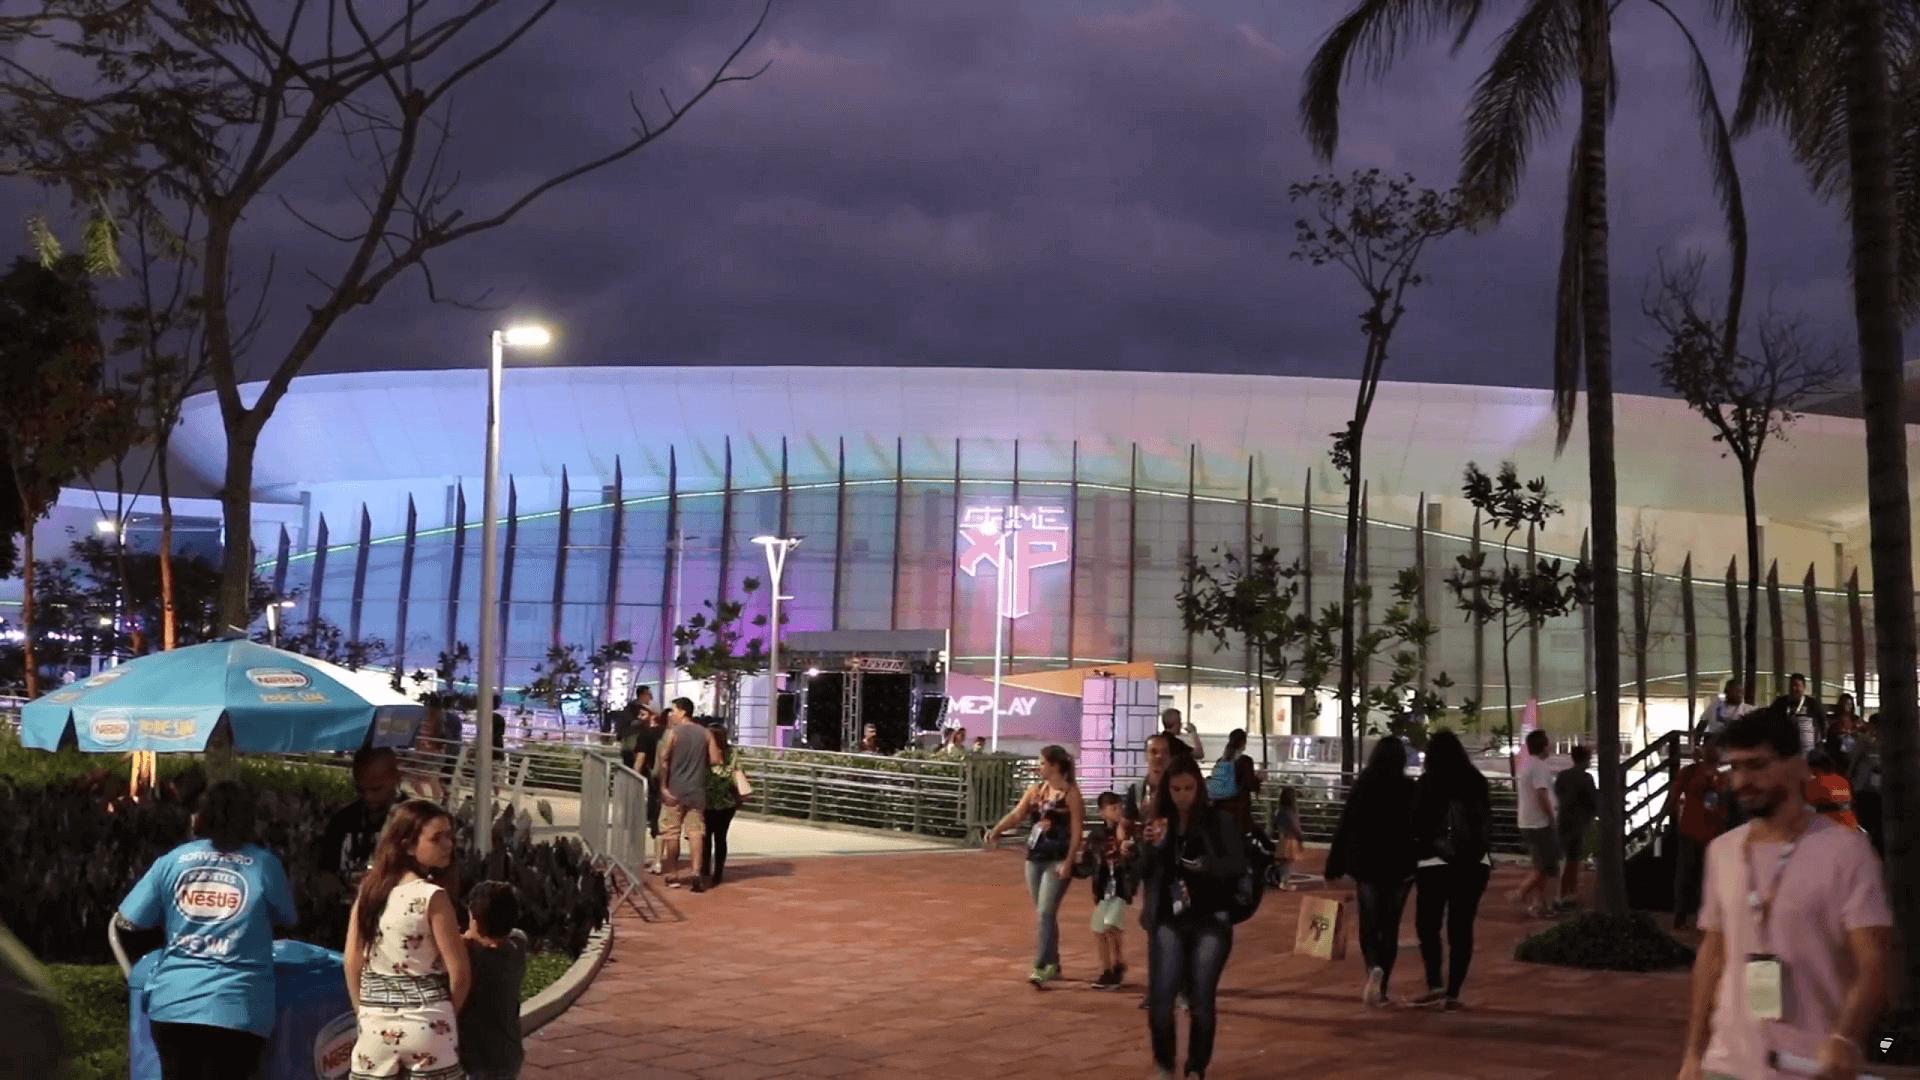 Foto de Confira como foi a Game XP 2018 realizada neste último final de semana no Rio de Janeiro